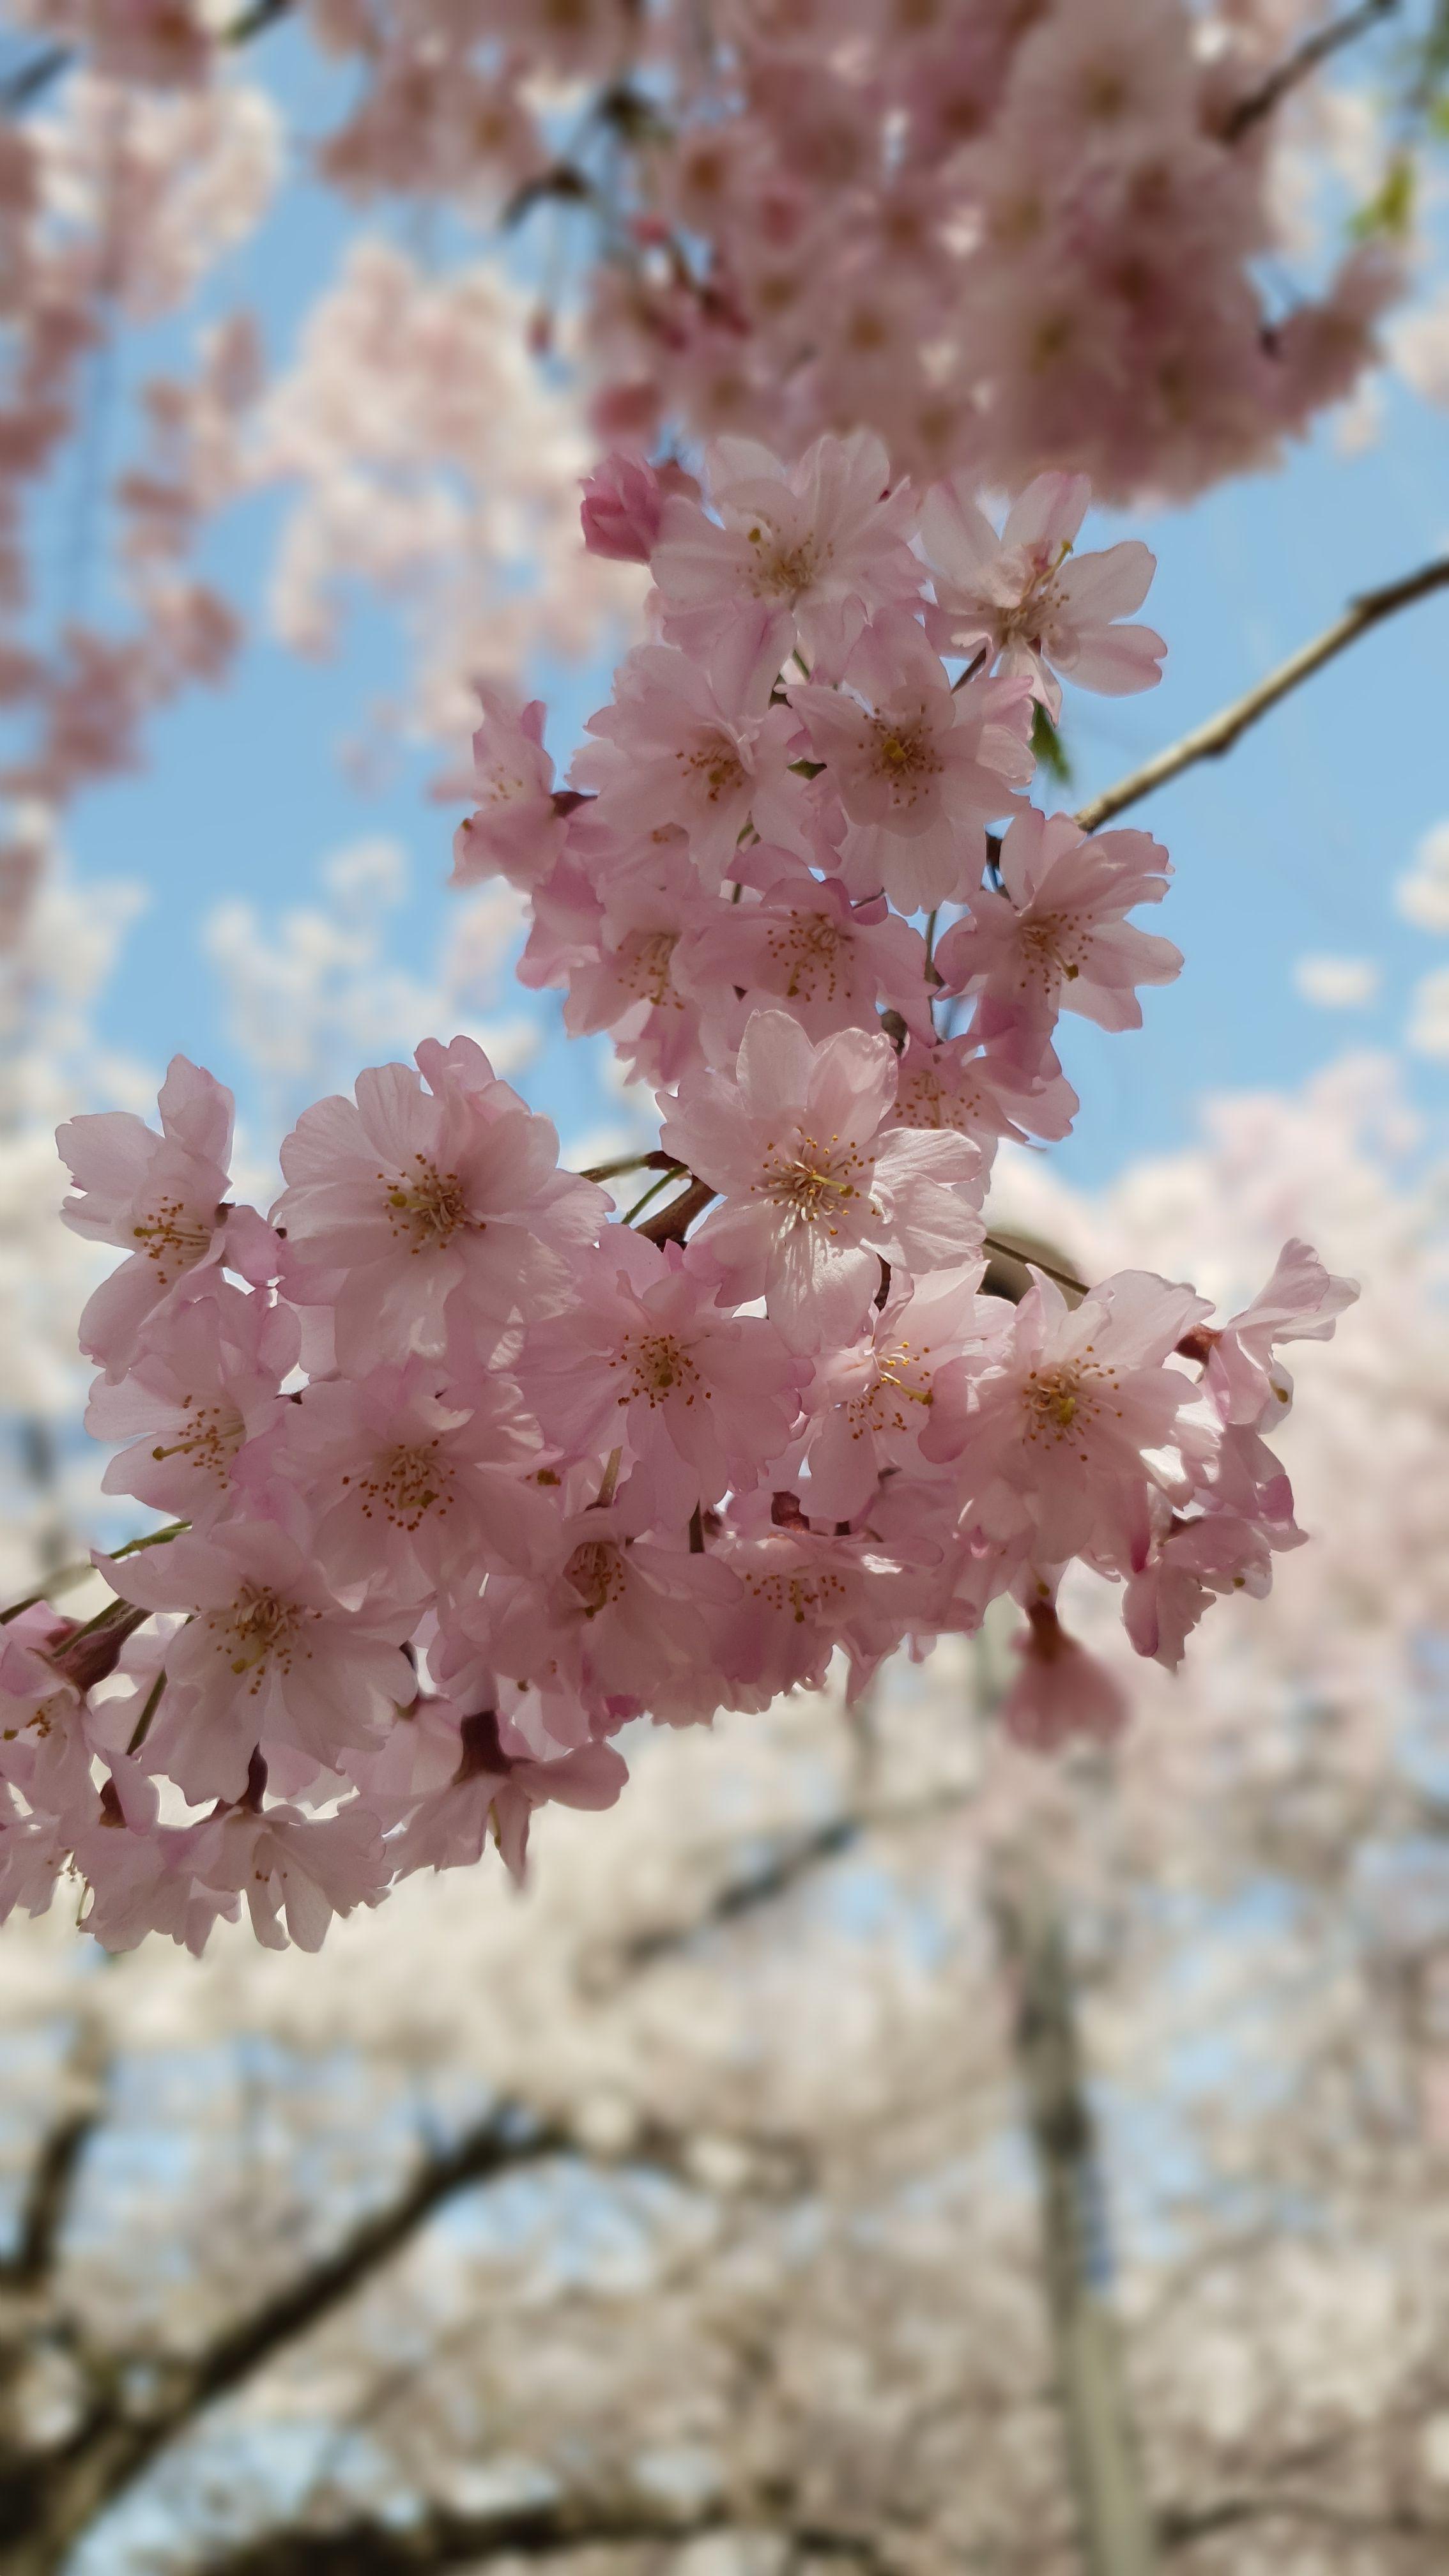 Cherry Blossoms In Japan Cherry Blossom Japan Osaka Castle Cherry Blossom